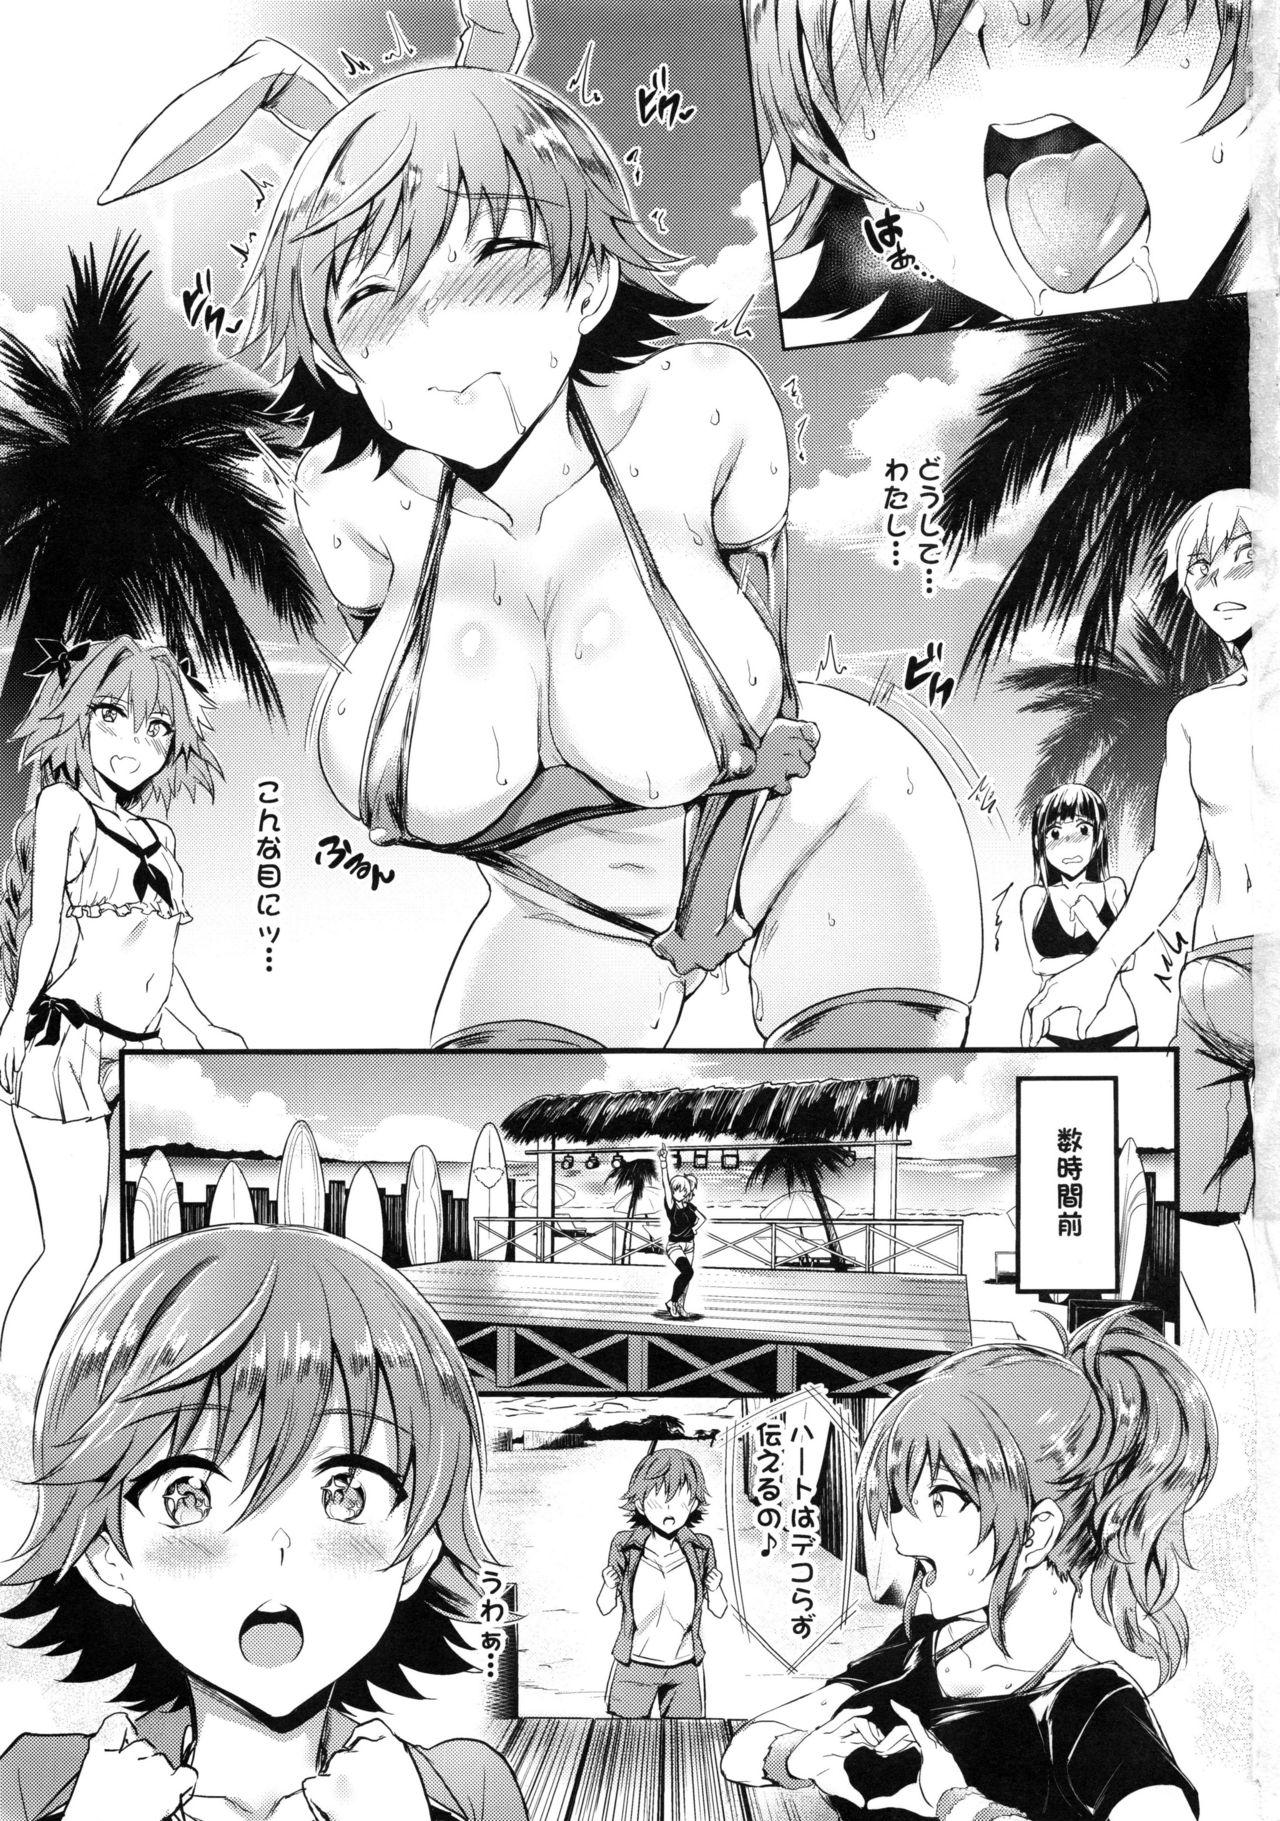 (C92) [BRIO (Puyocha)] Mika-nee no Tanryoku Shidou - Mika's Guide to Self-Confidence (THE IDOLM@STER CINDERELLA GIRLS) 1